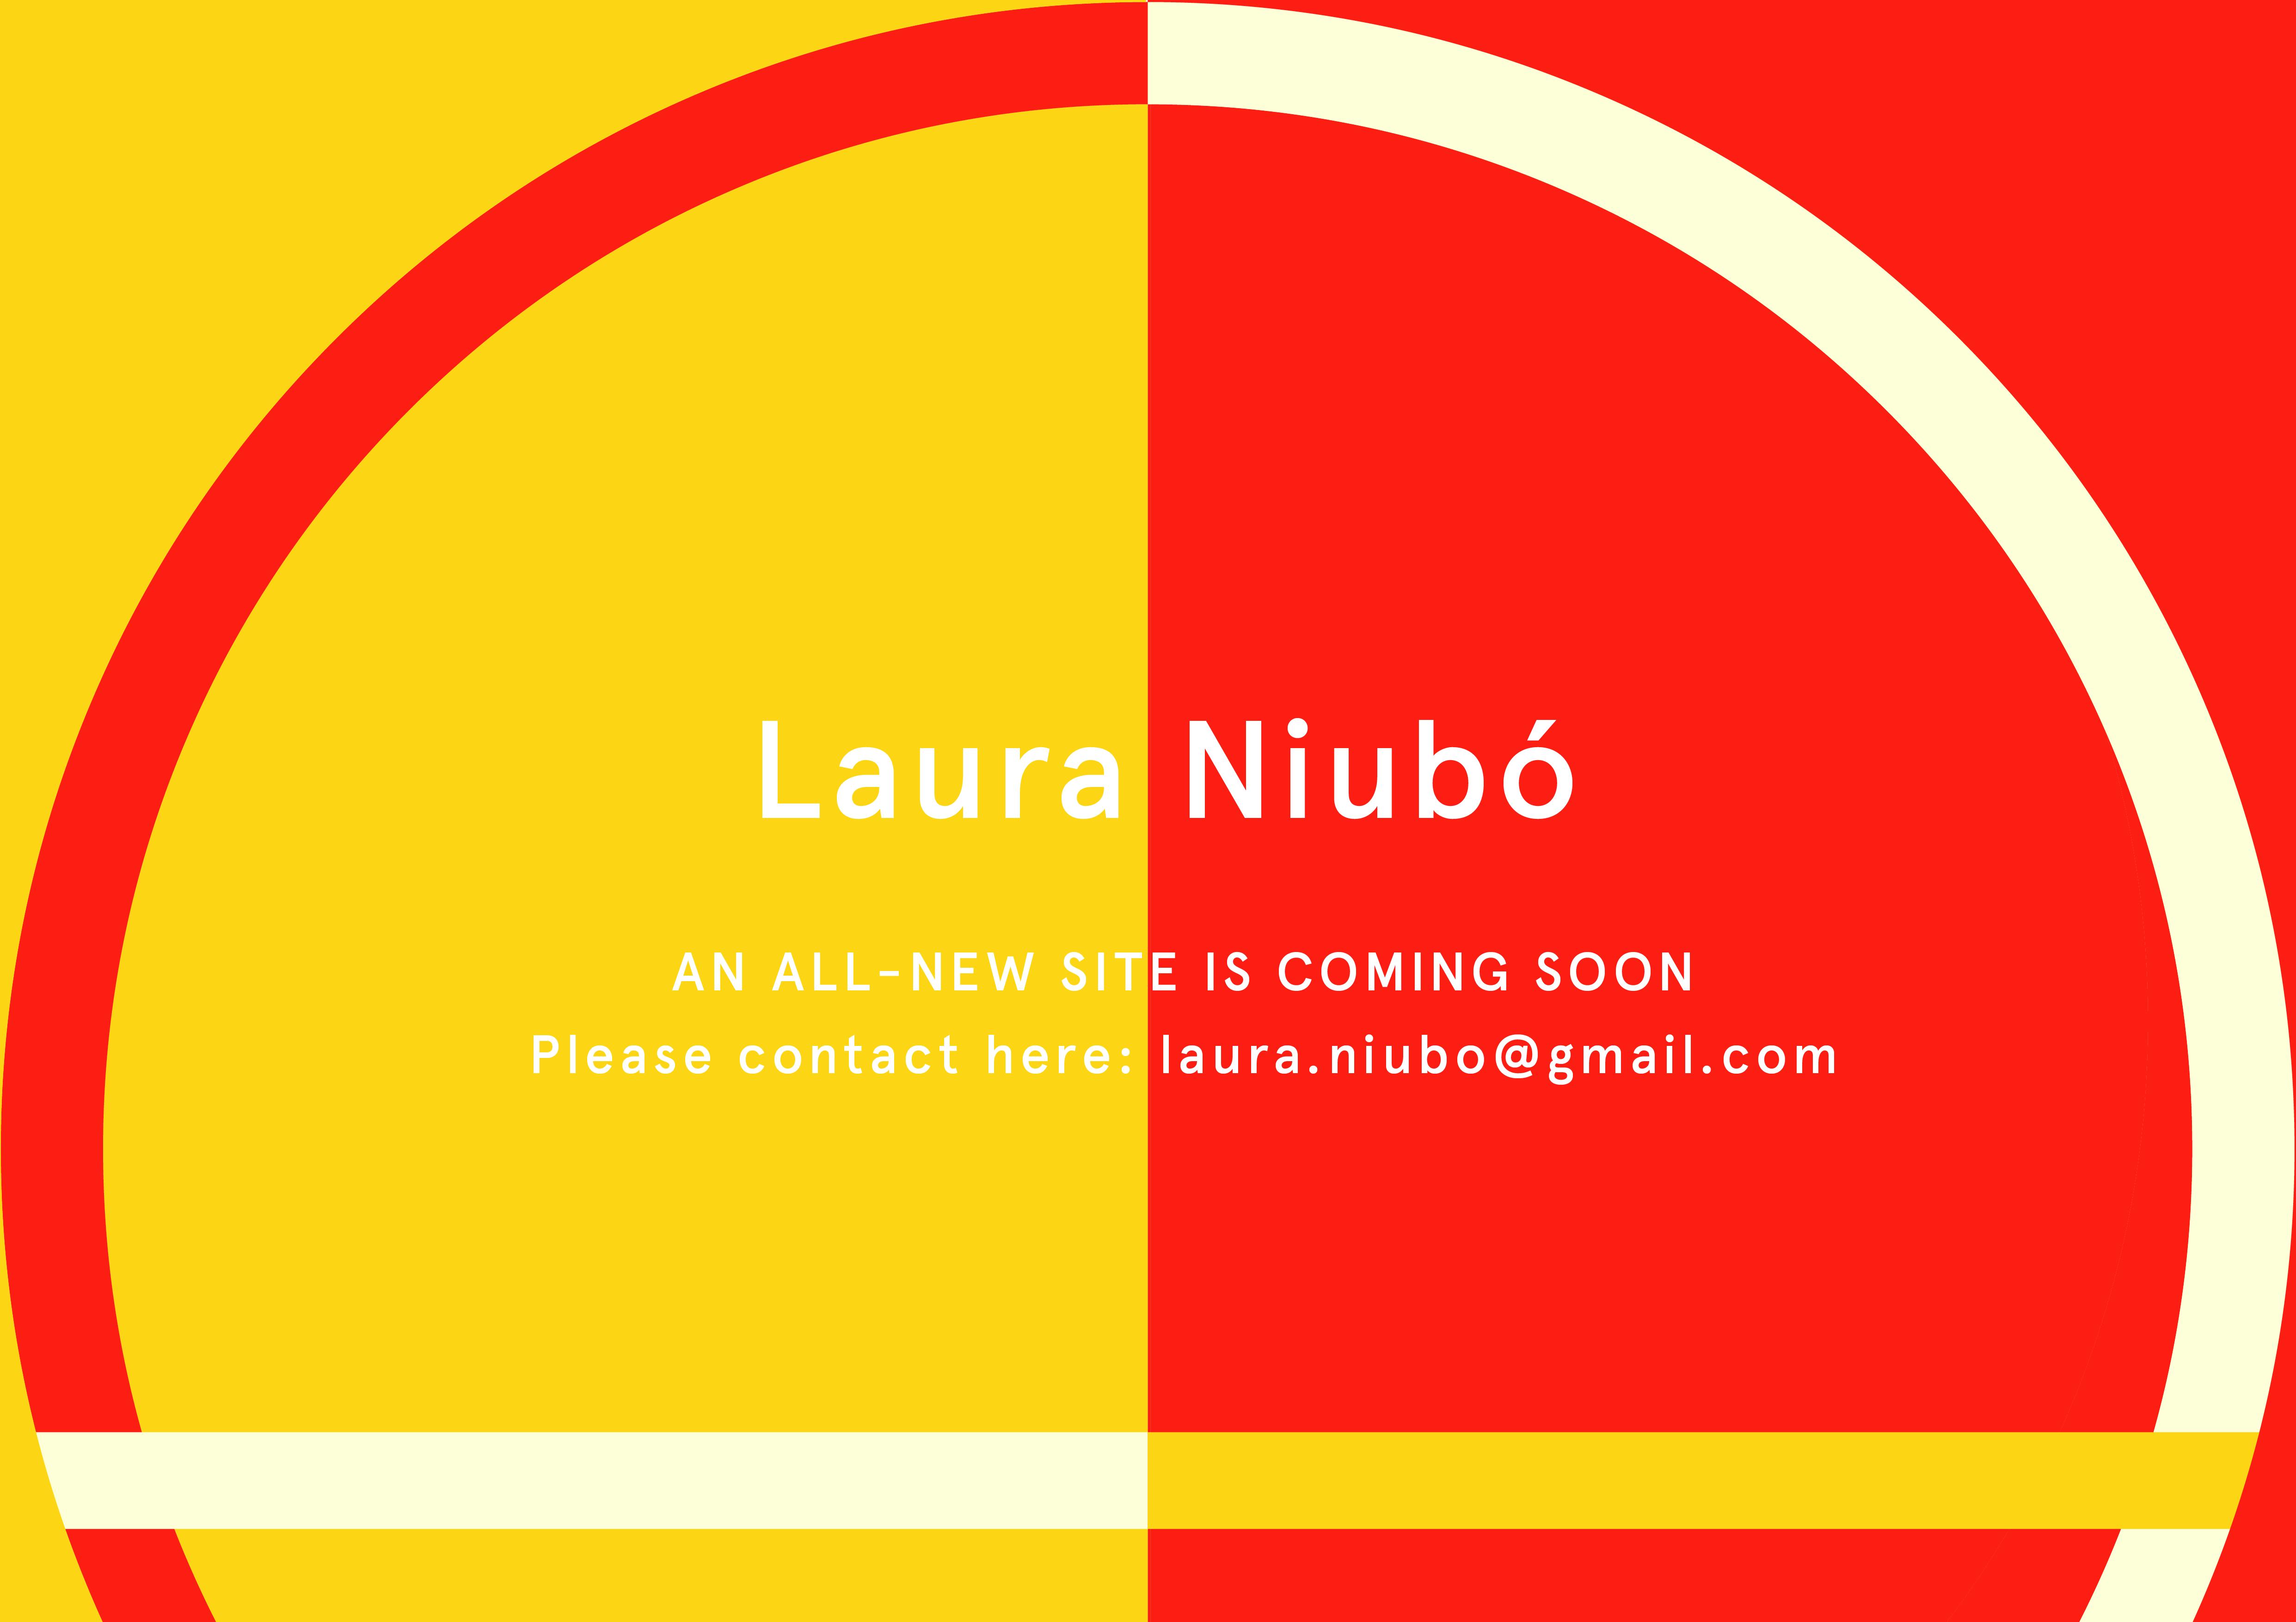 laura_niubo